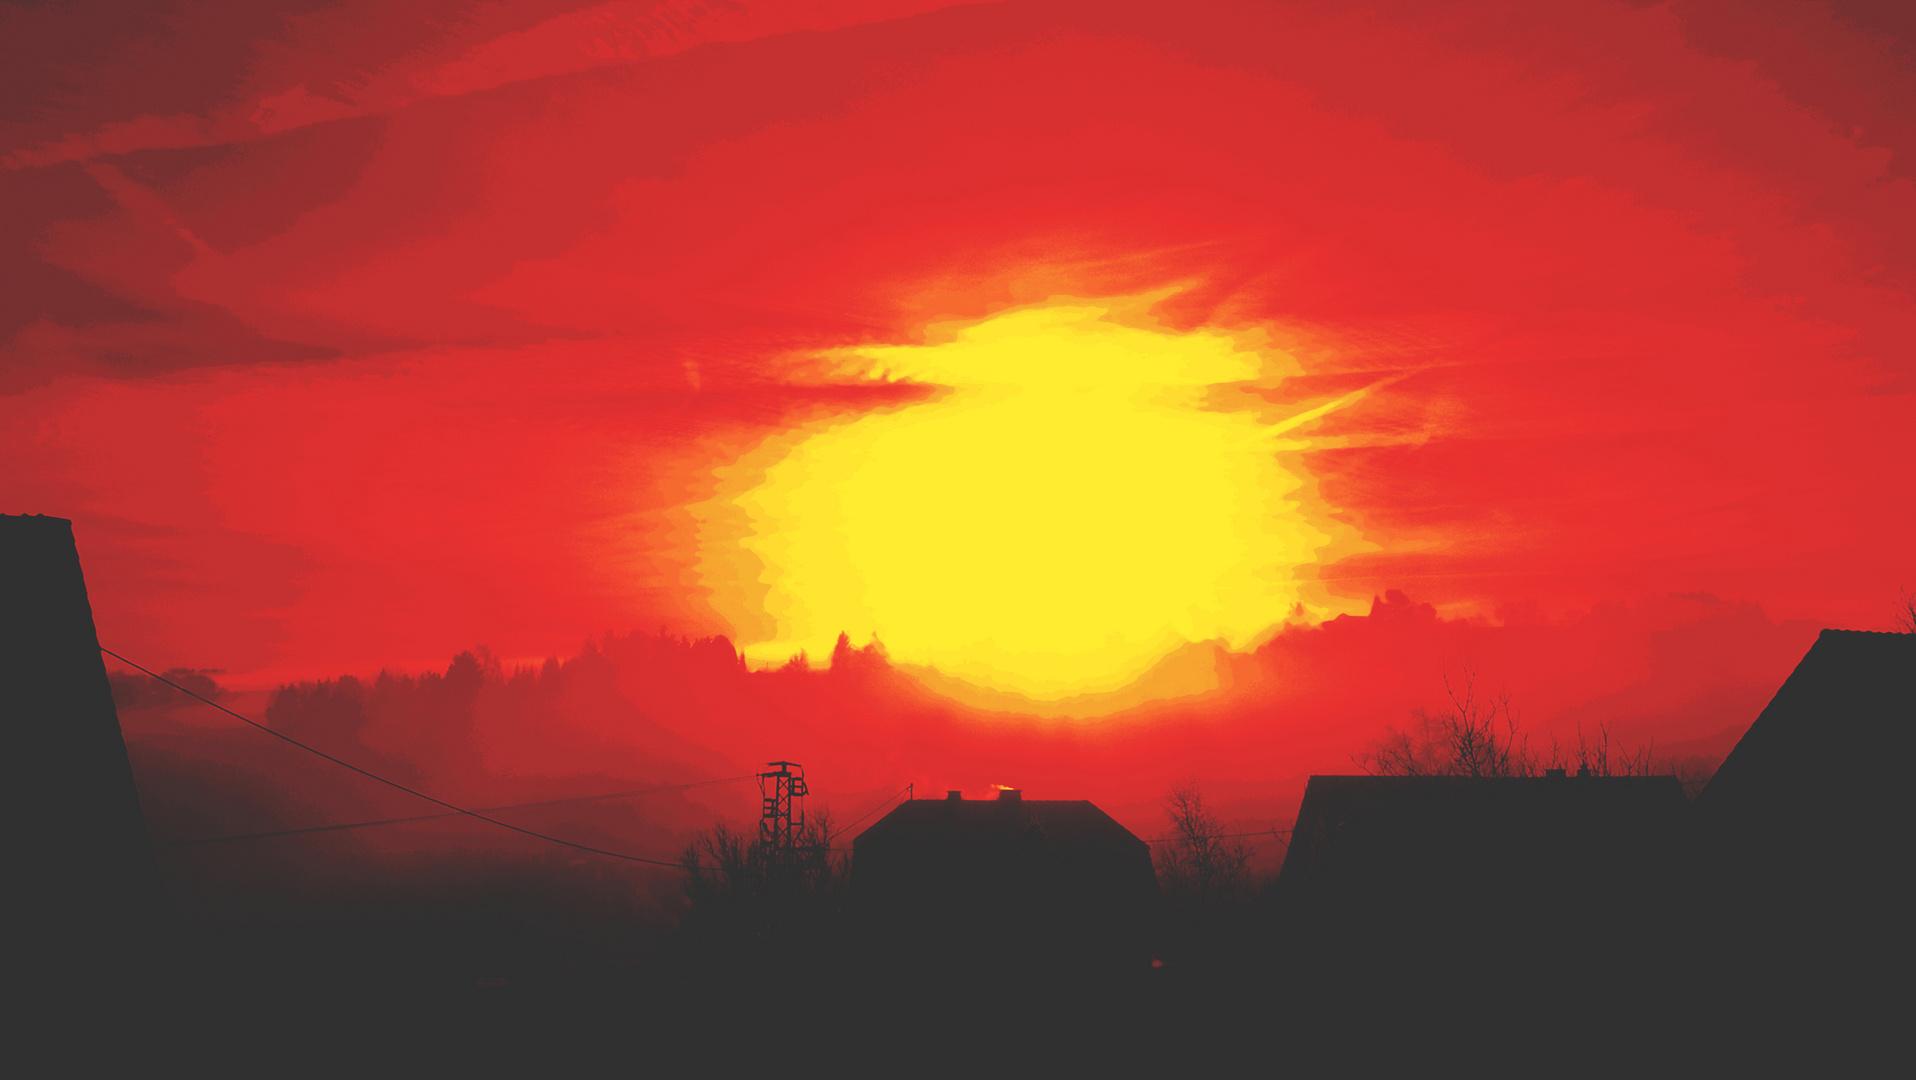 Sonnenaufgang - Fantasie!